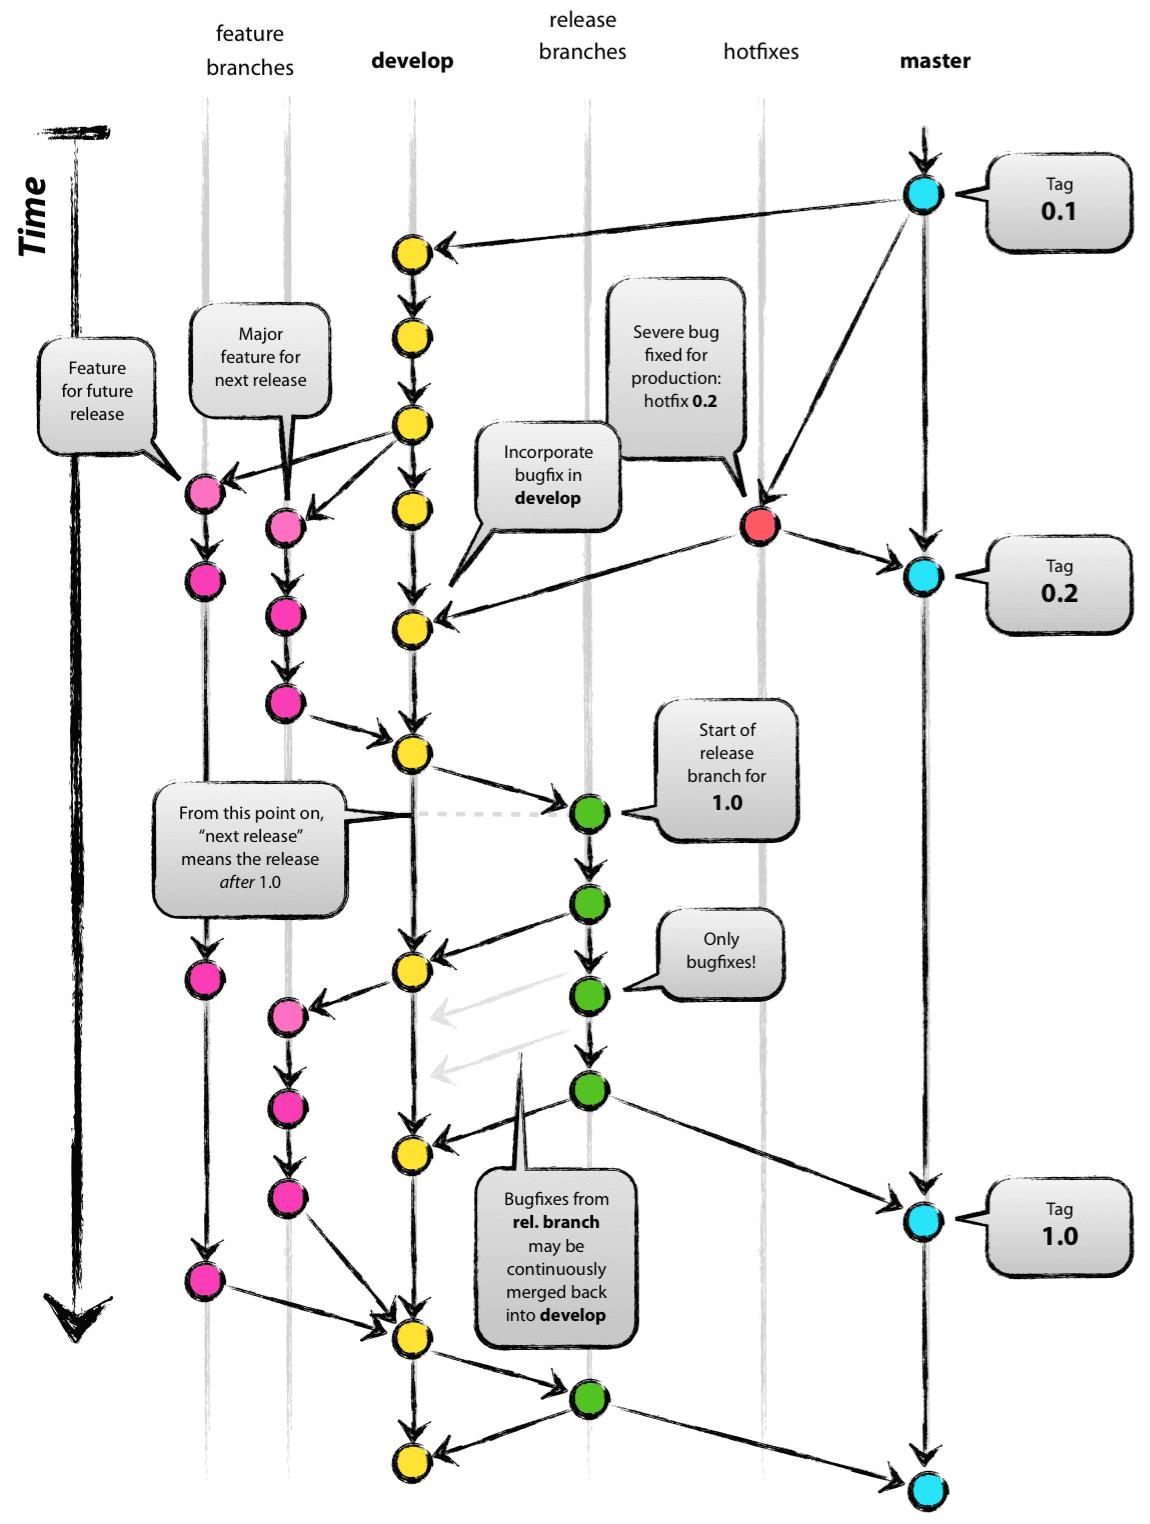 branching-model-illustration